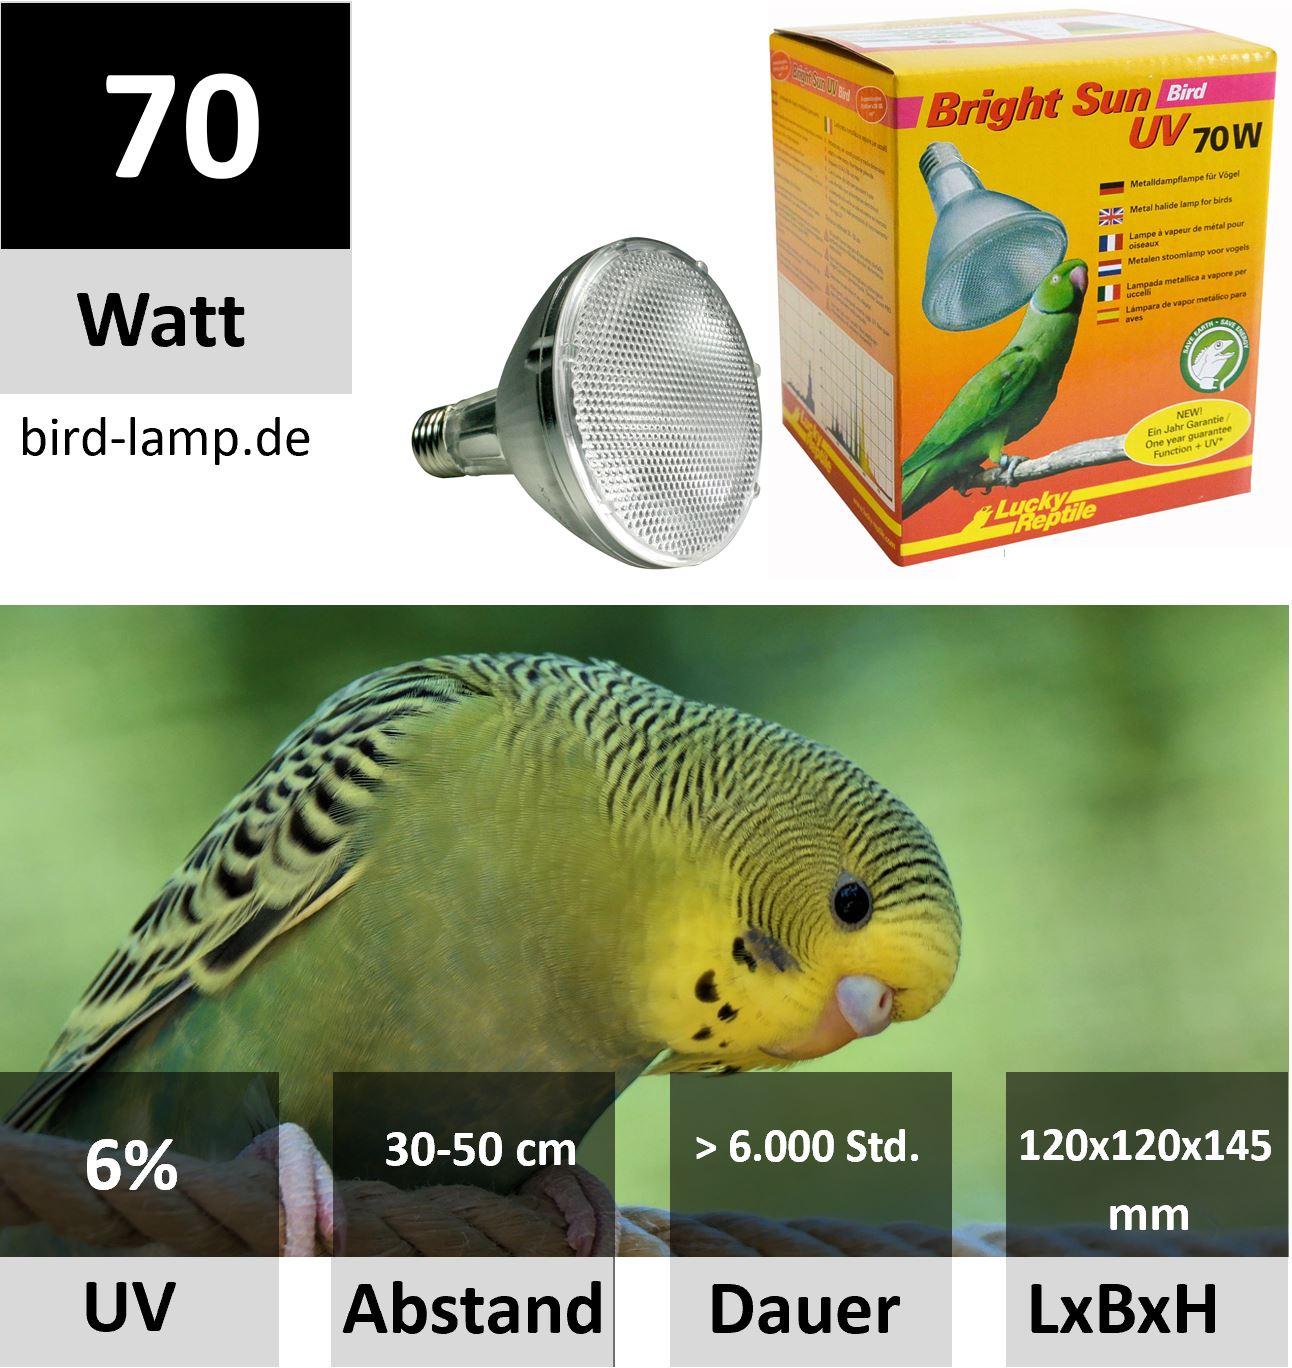 Lucky Reptile Bright Sun UV Bird 70 Watt Metalldampflampe